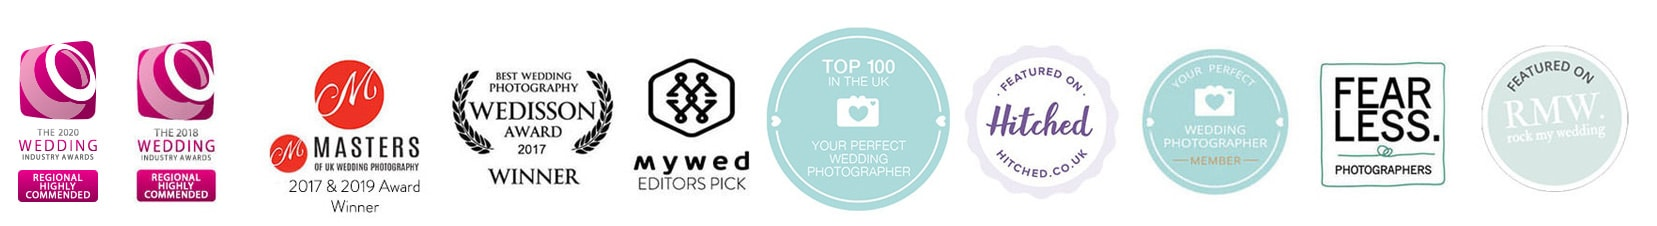 Award Winning Creative Midlands Wedding Photographer